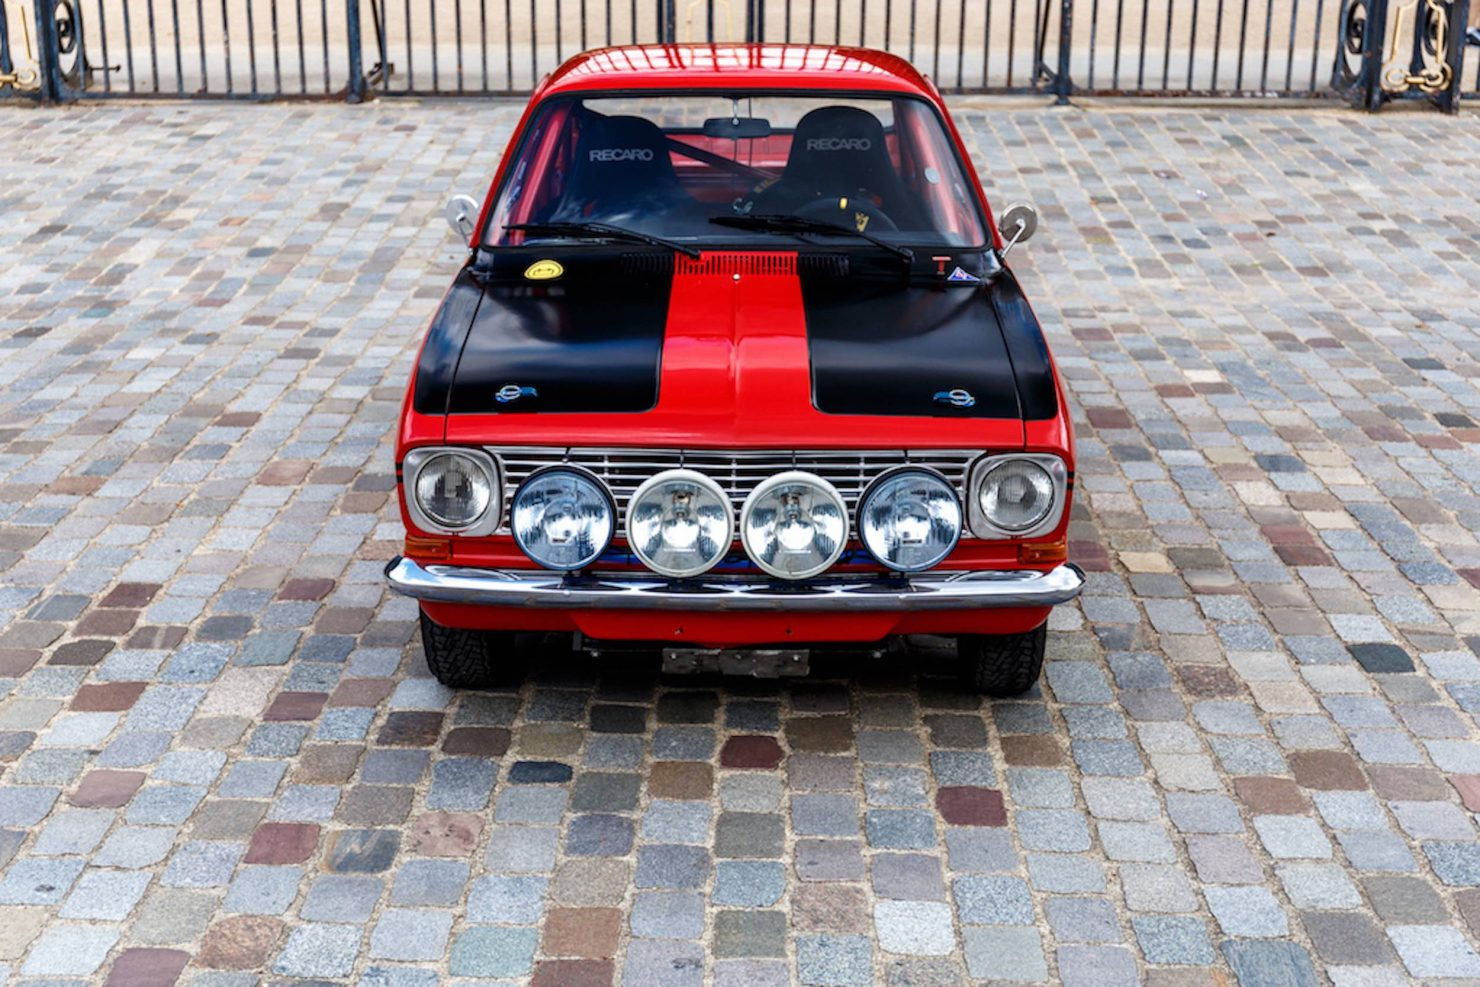 opel kadett rallye car 4 1480x987 - 1969 Opel Rallye Kadett